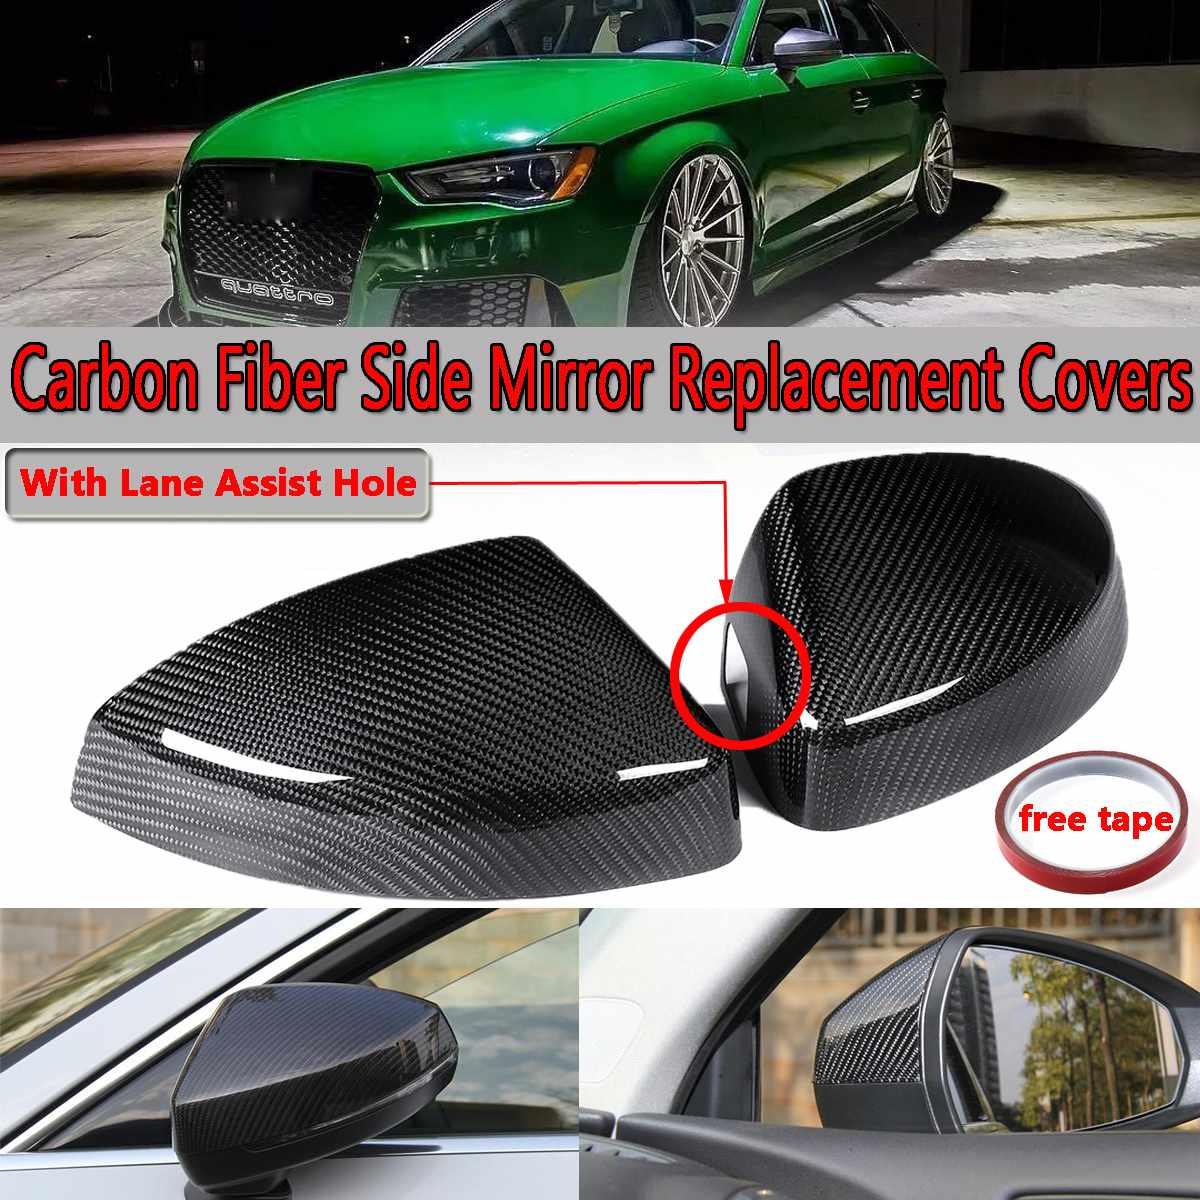 Здесь можно купить  2pcs Real Carbon Fiber Add-on Car Side Mirror Covers For Audi A3/S3/RS3 Models 2014-2018 With Lane Assist Option  Автомобили и Мотоциклы